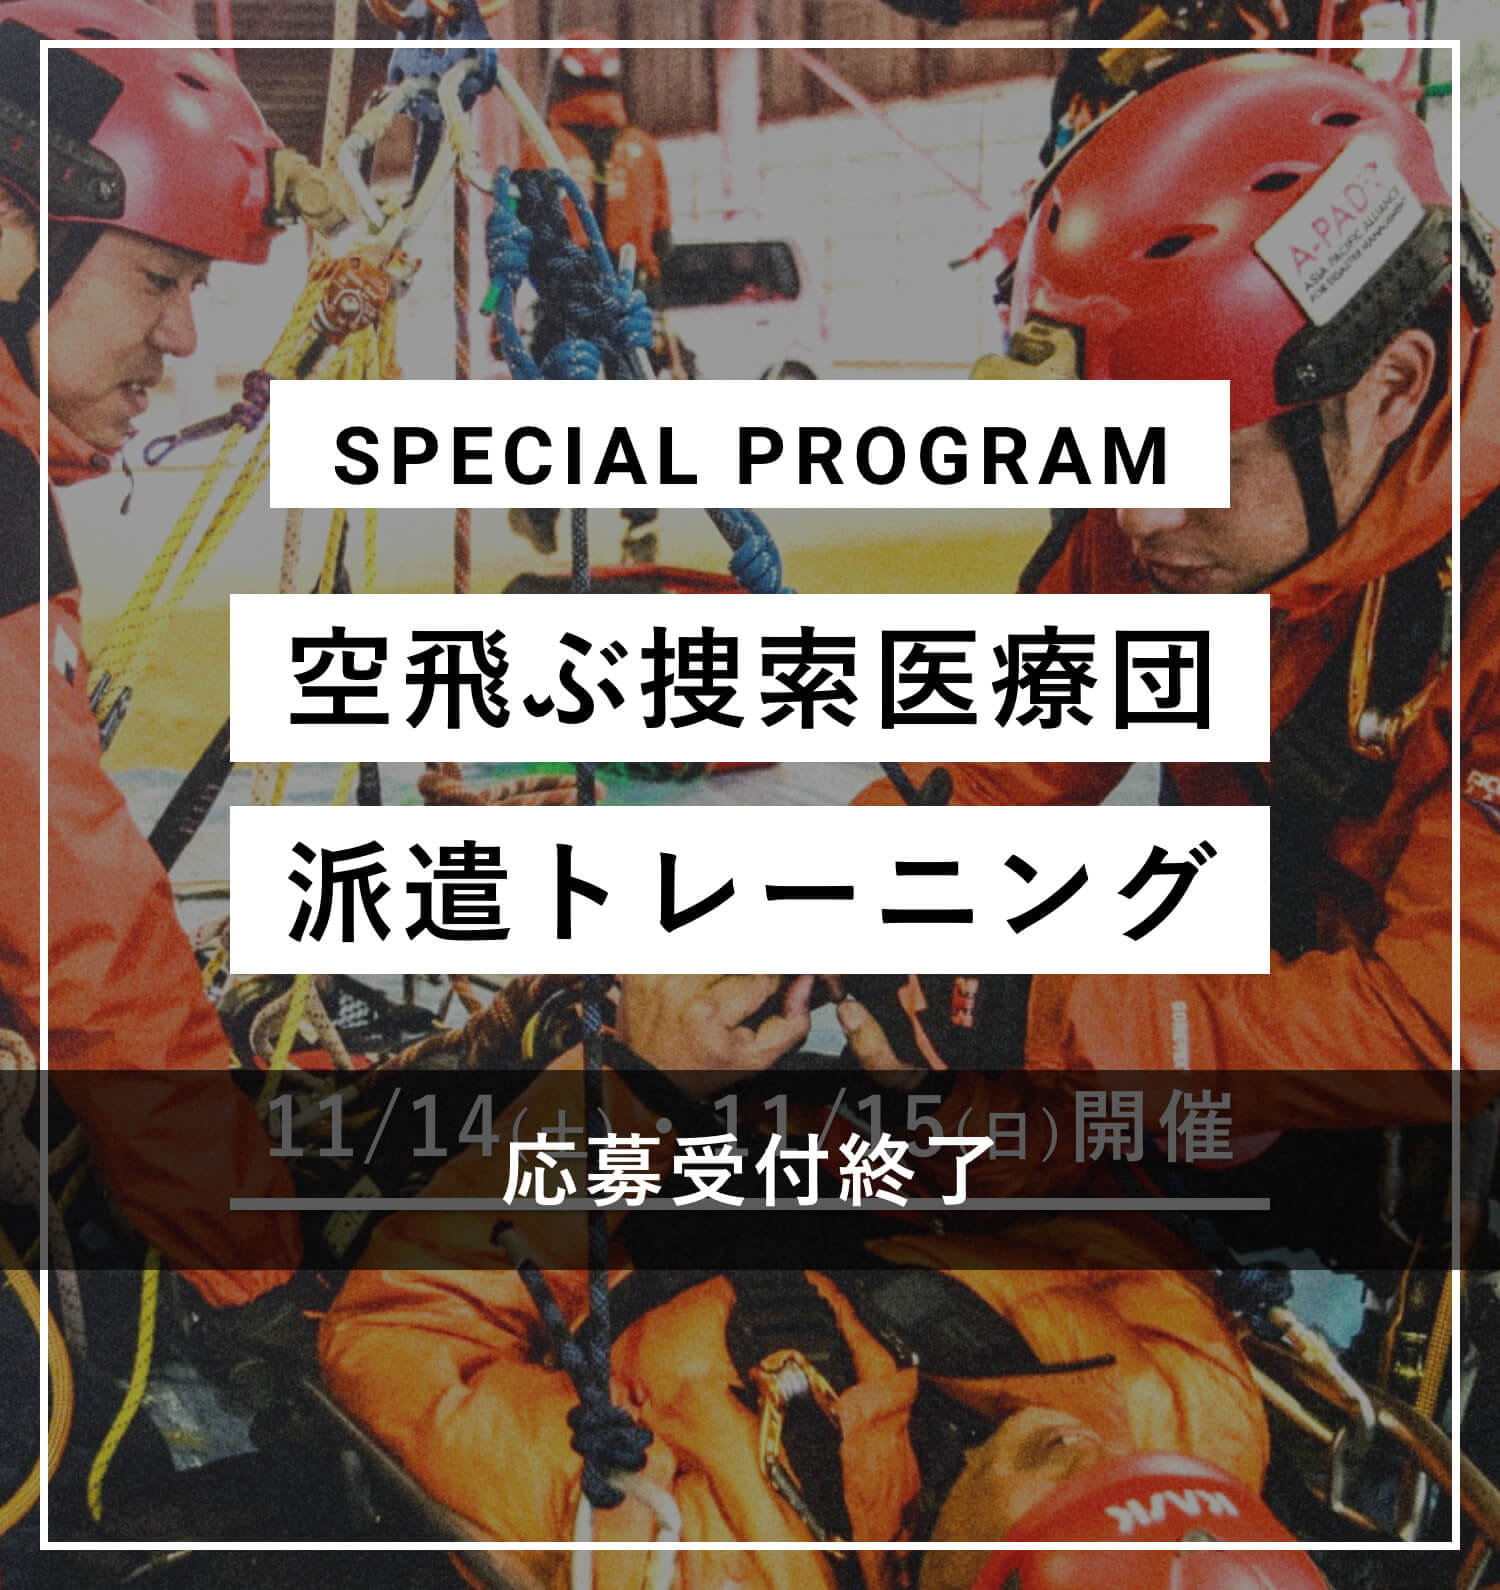 SPECIAL PROGRAM 空飛ぶ捜索医療団派遣トレーニング